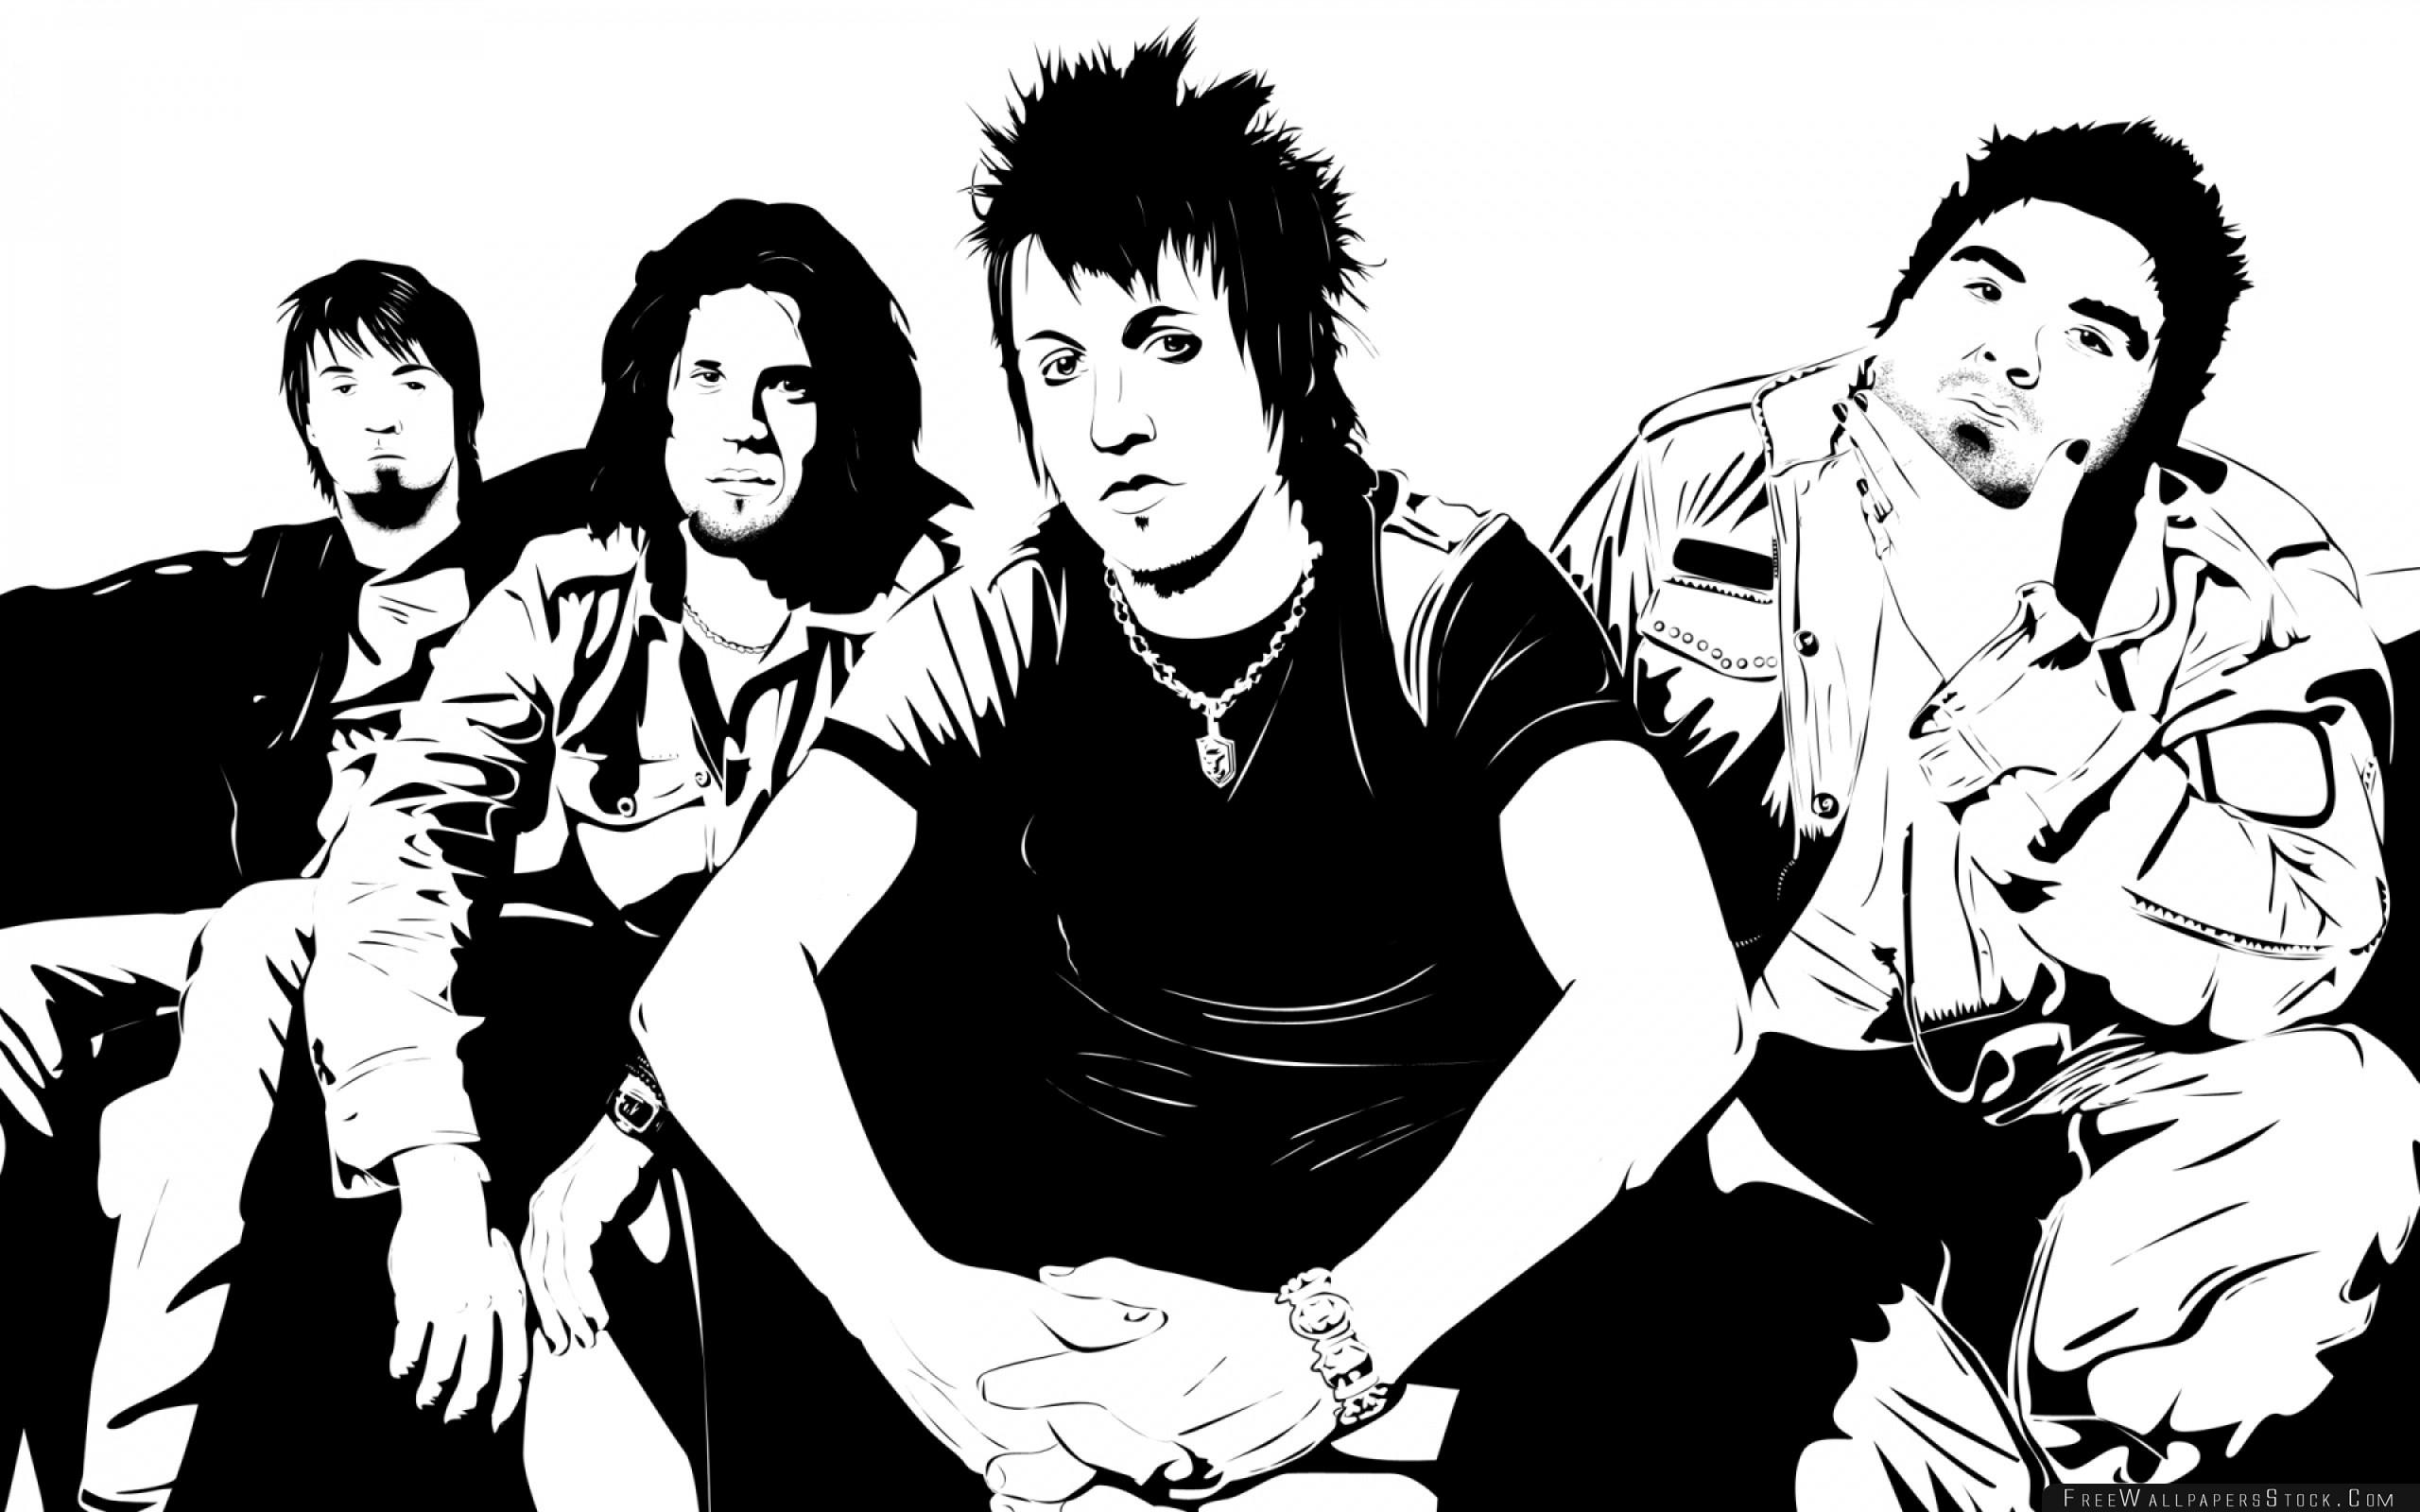 Download Free Wallpaper Papa Roach Members Band Look Chain